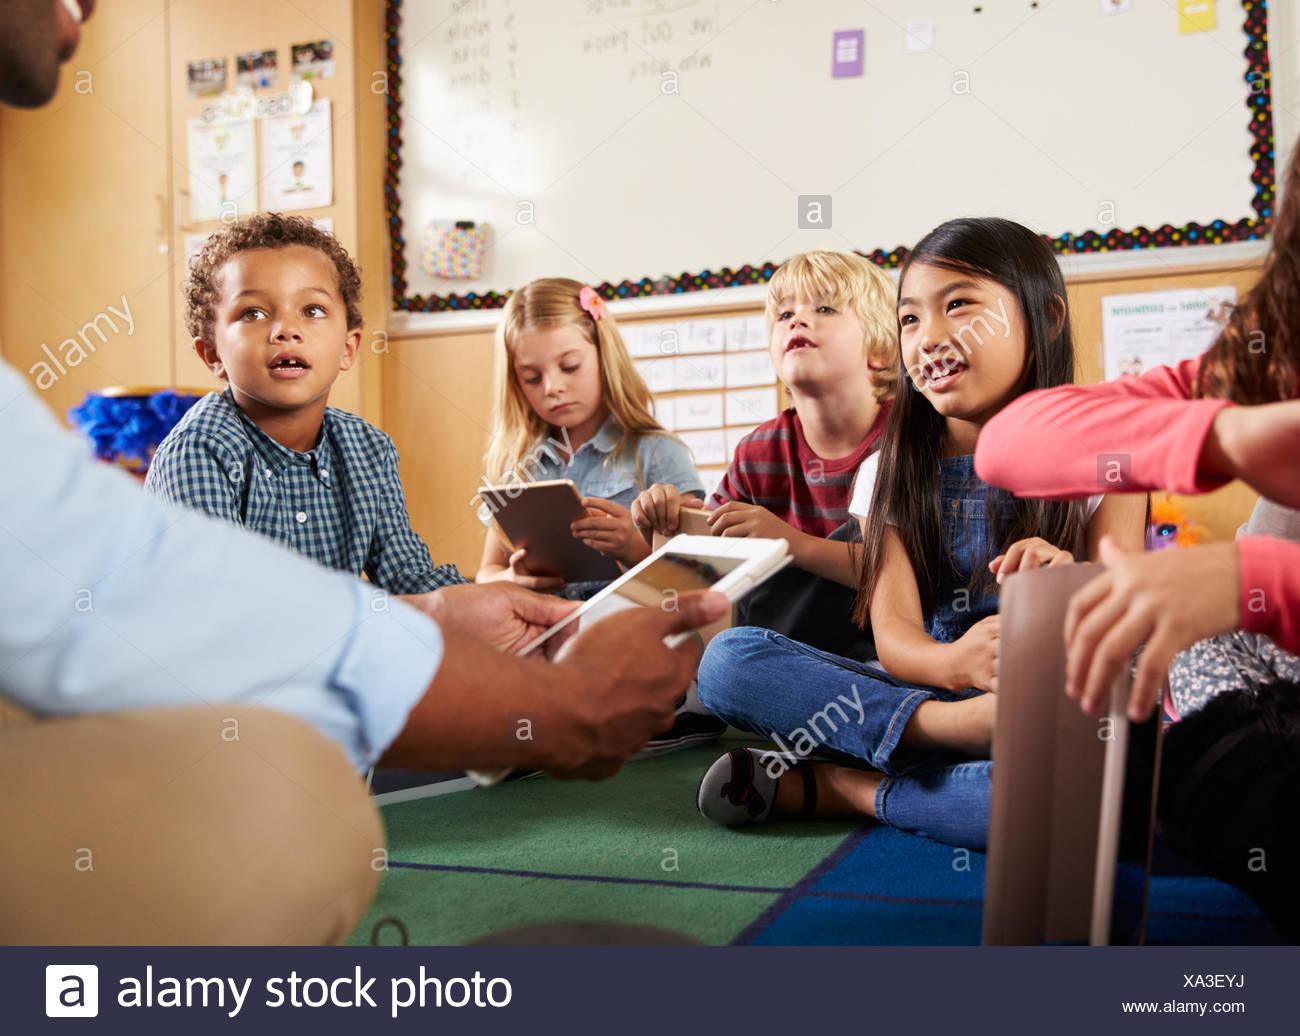 Elementary school class sitting cross legged using tablets - Stock Image